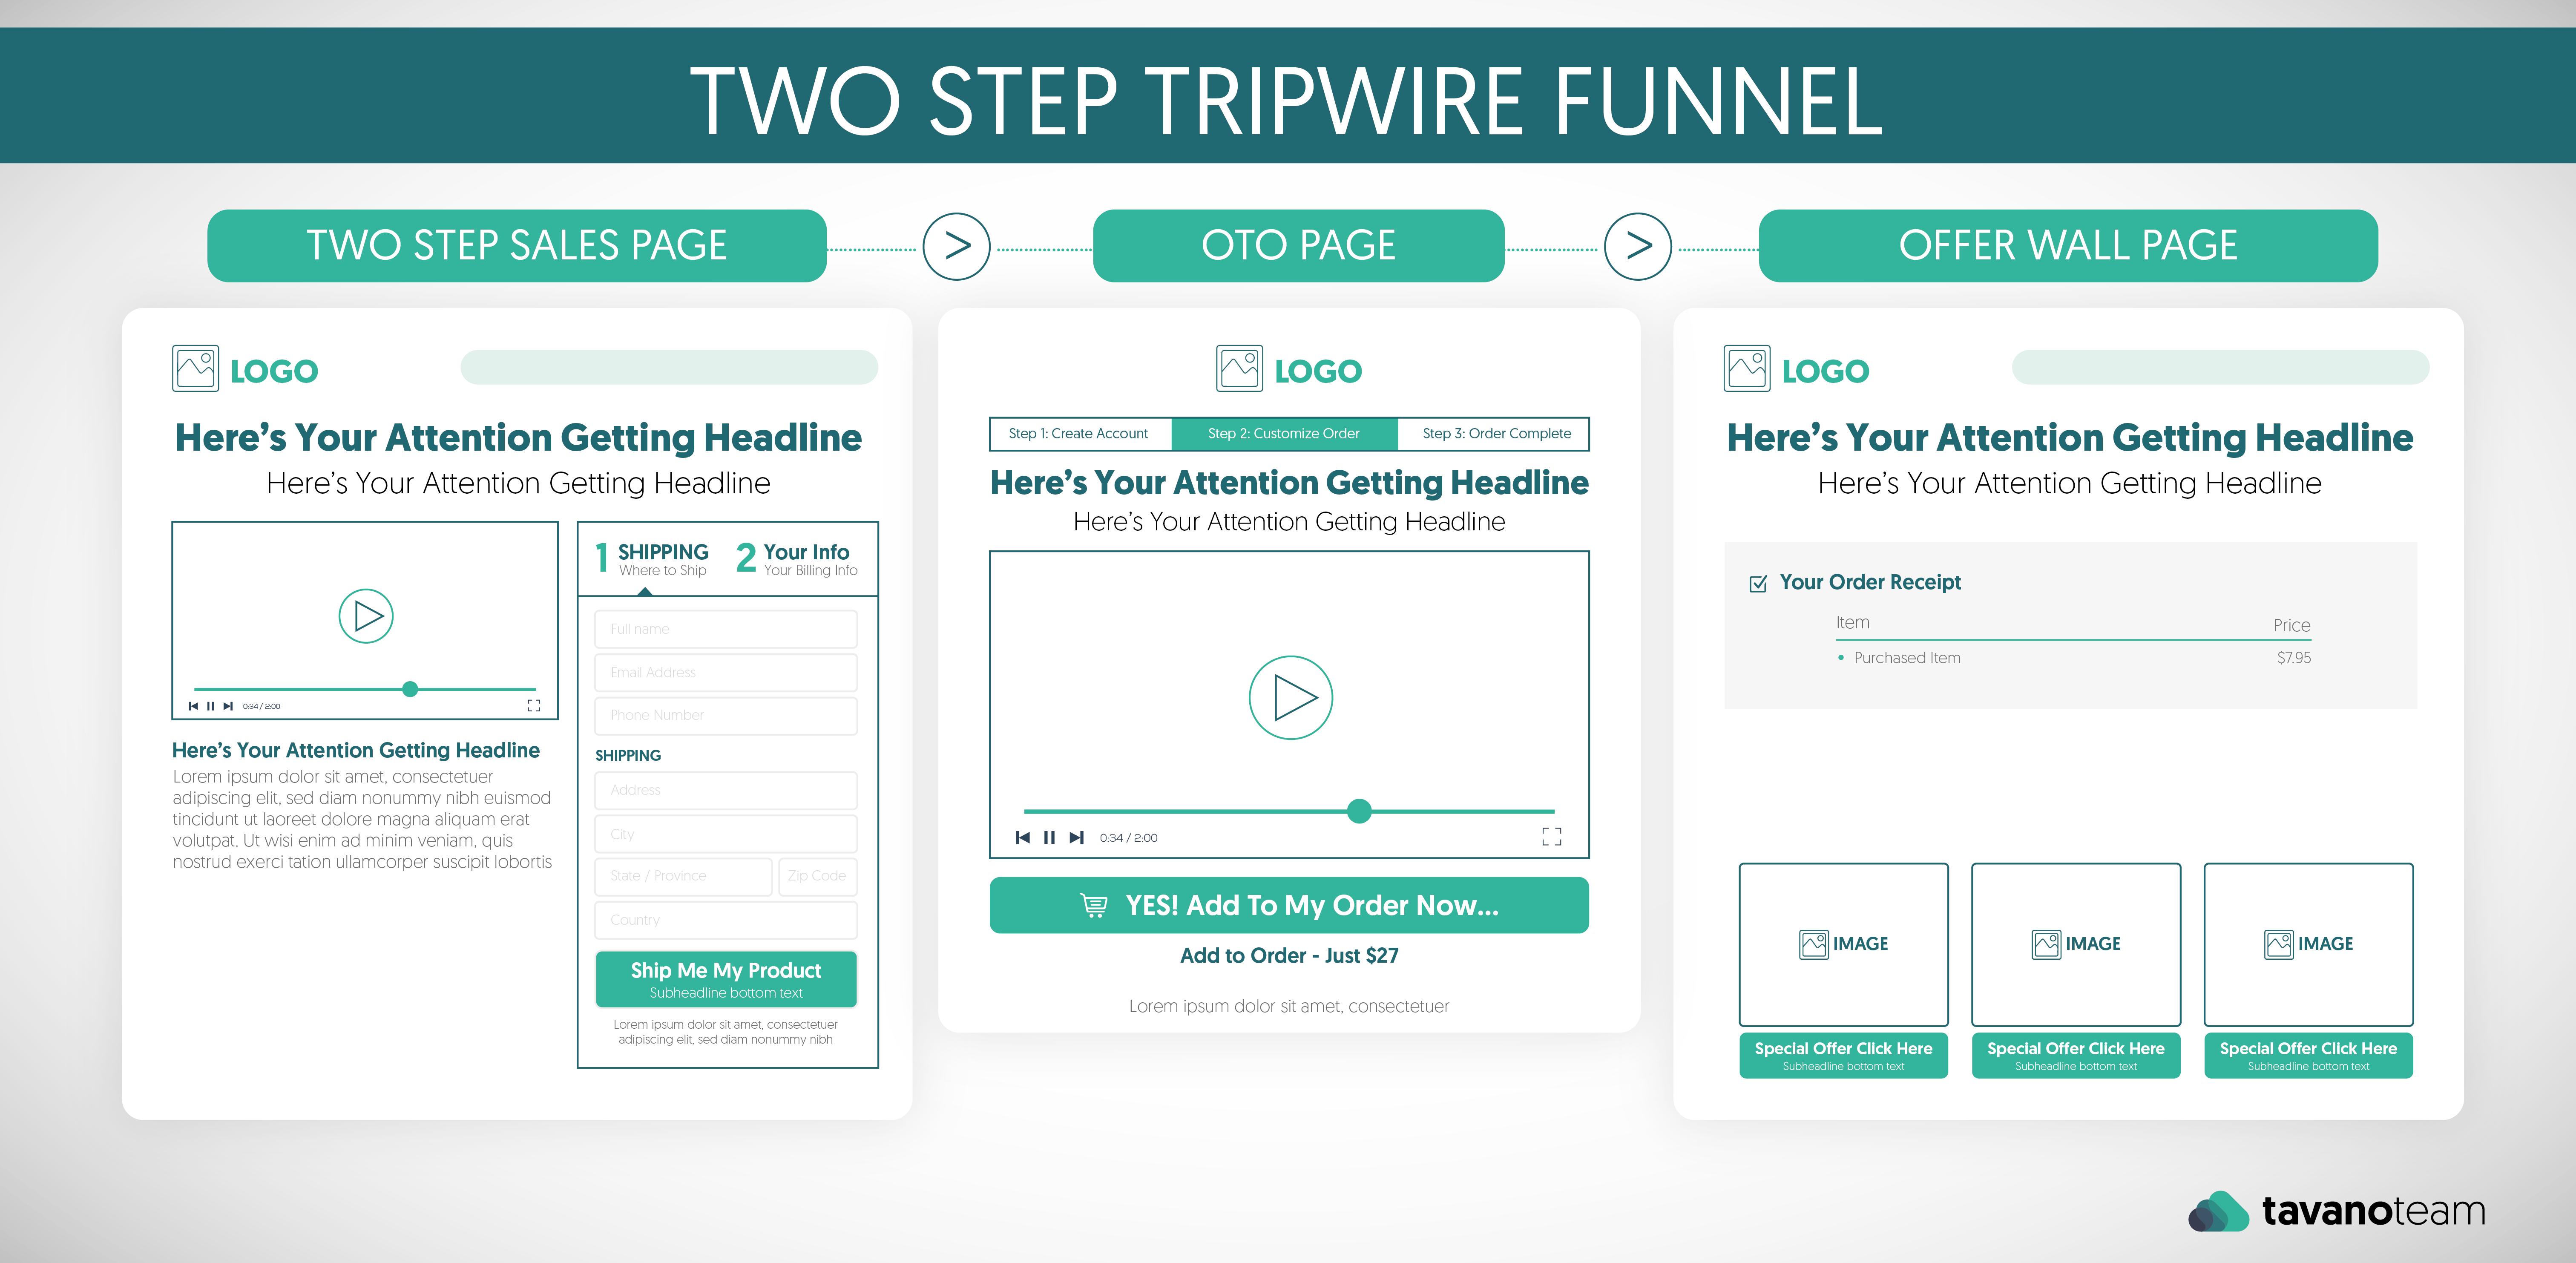 two step tripwire funnel suitecommerce advanced netsuite tavano team